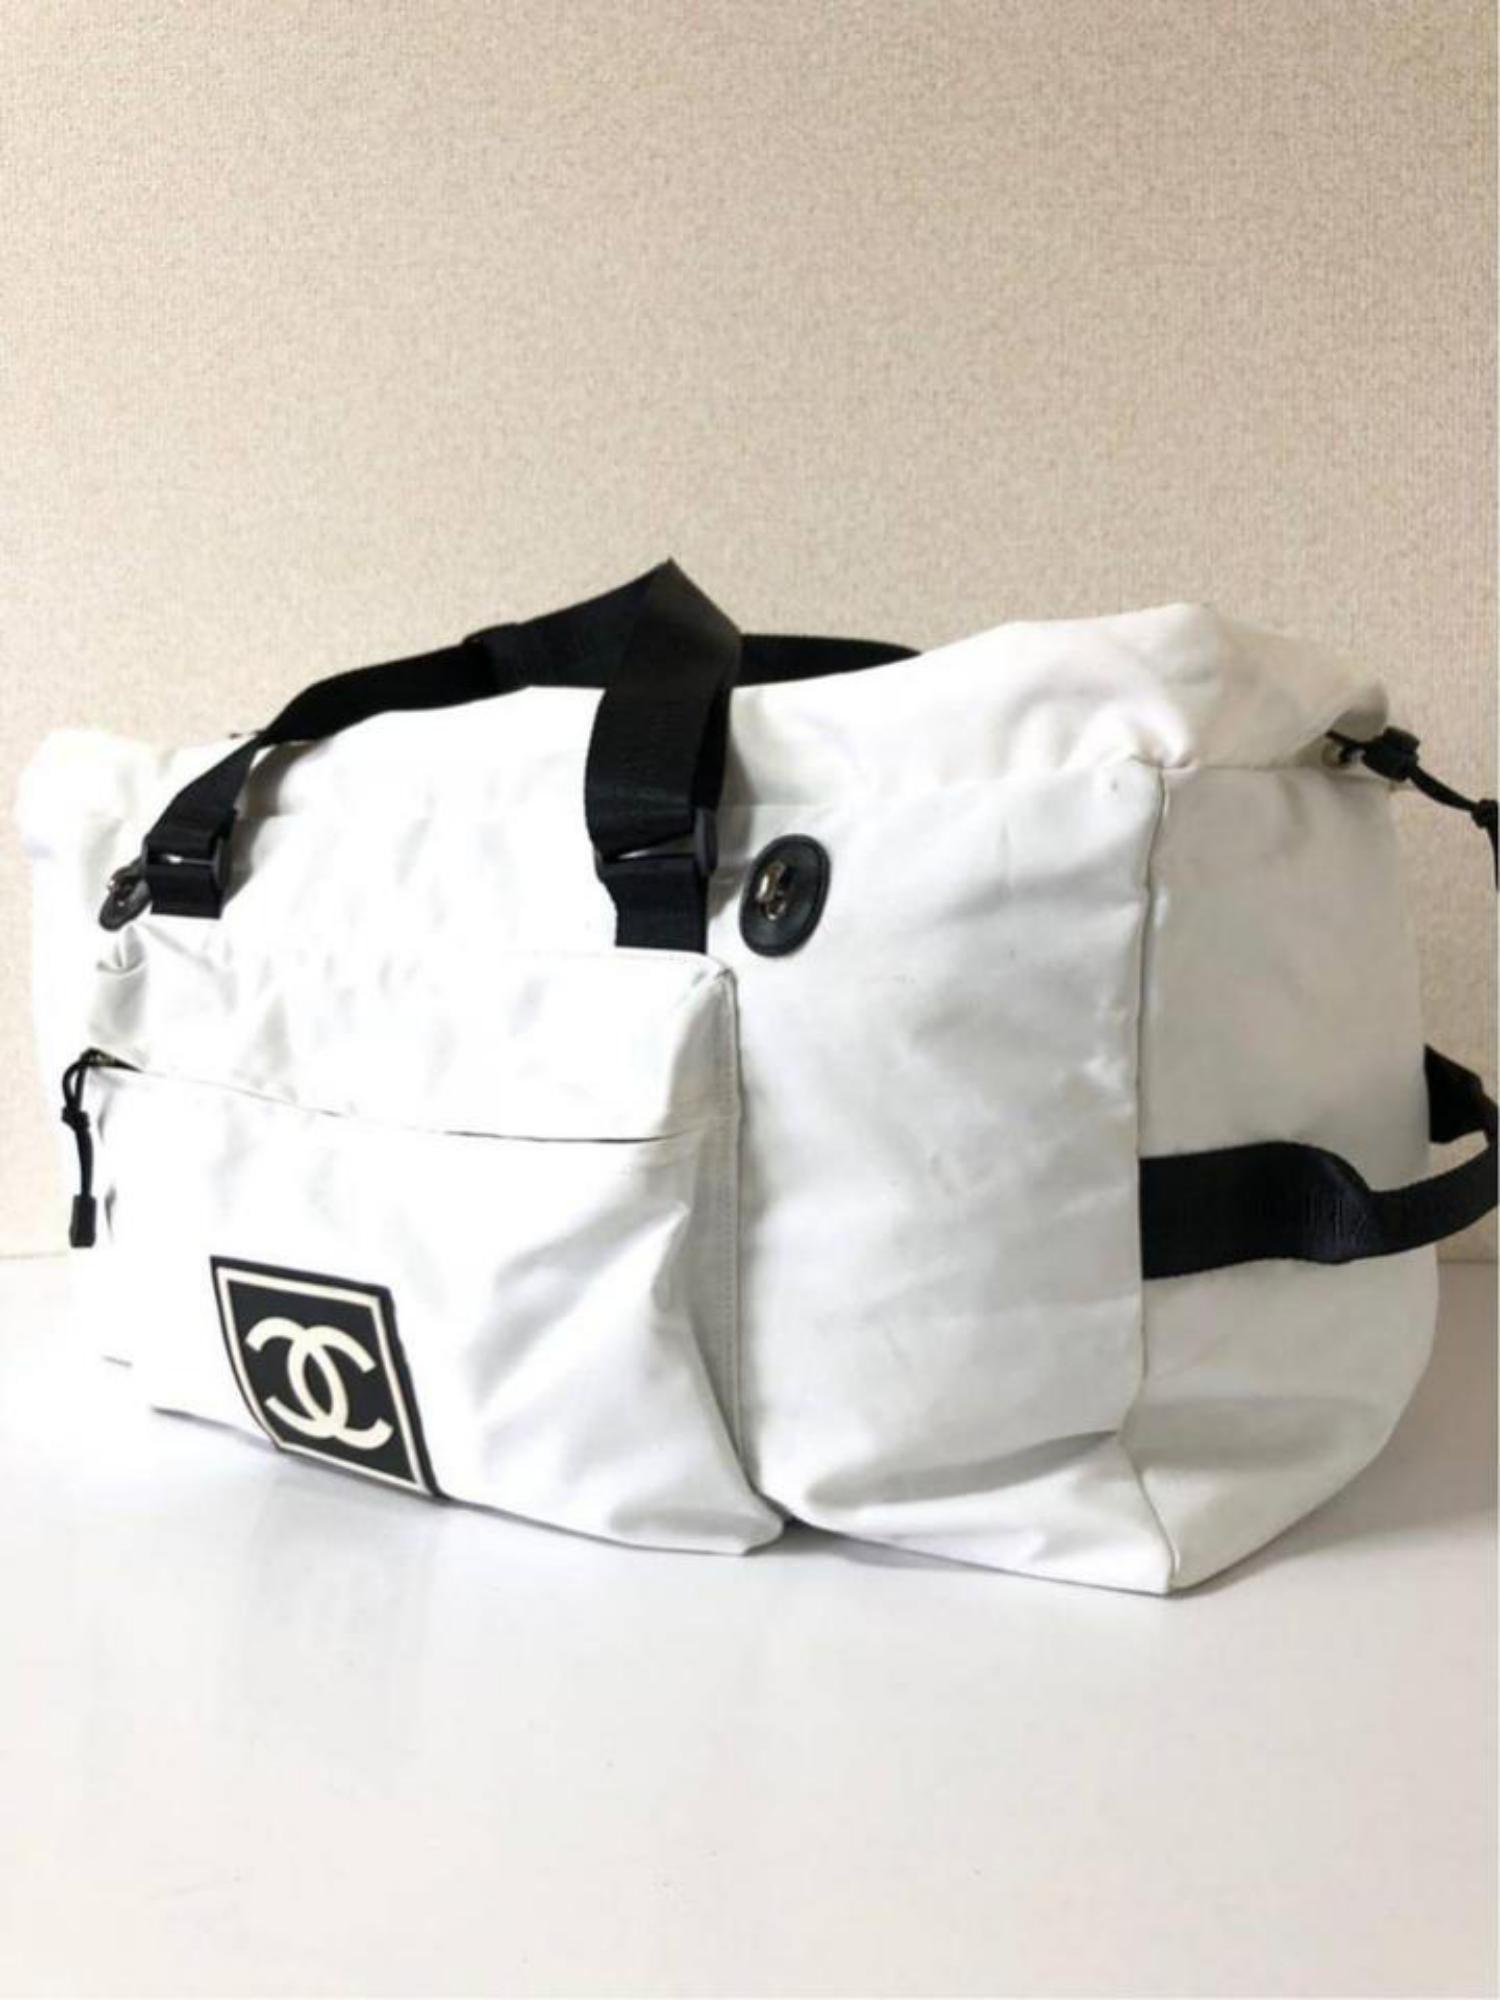 b5a1f97d30cb Chanel Extra Large Cc Sports Logo Boston Duffle 232511 White Nylon Travel  Bag at 1stdibs